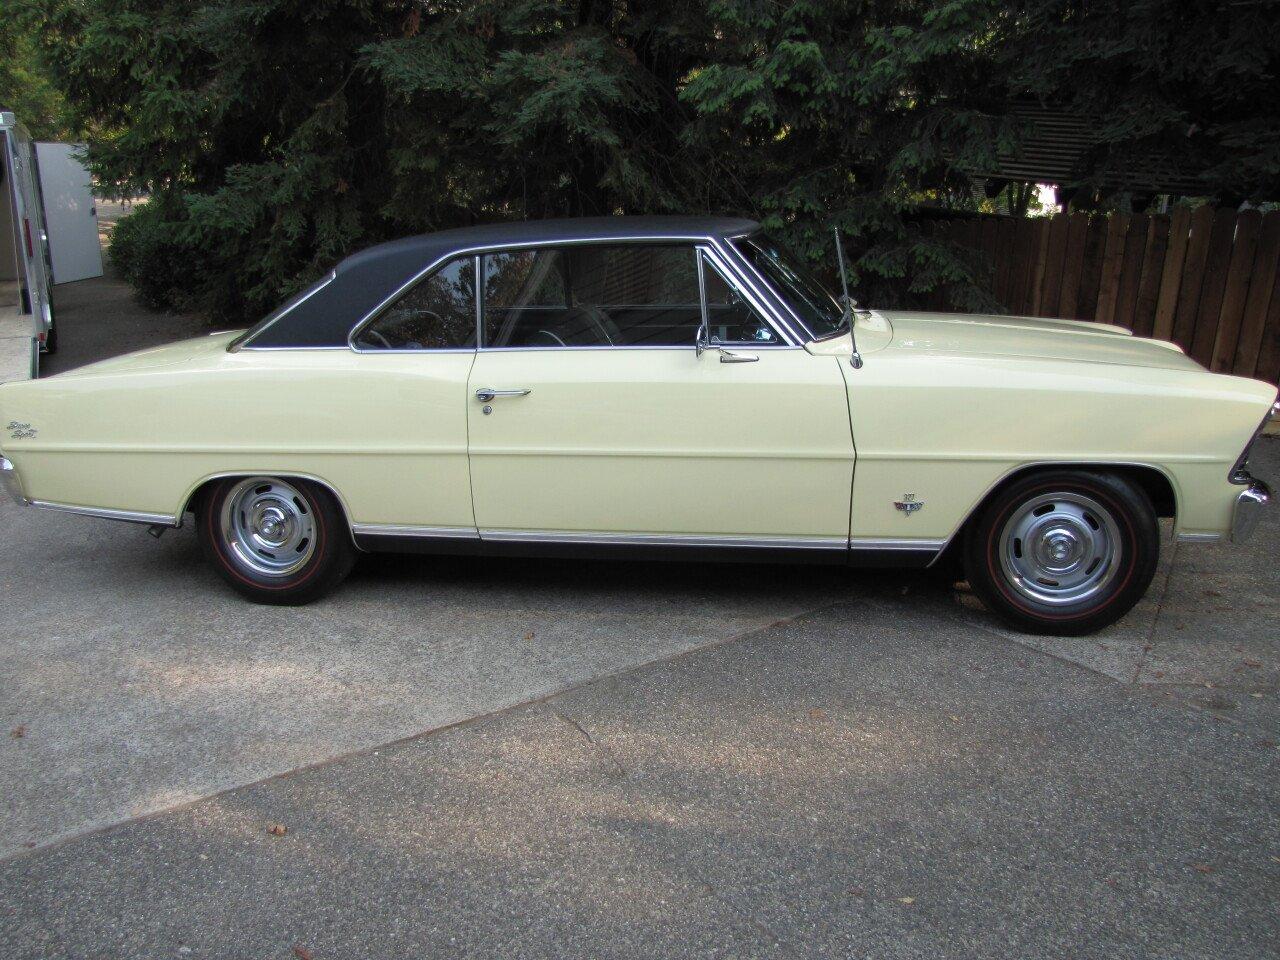 Old Corvettes For Sale By Owner >> 1967 Nova Parts For Sale | Autos Post